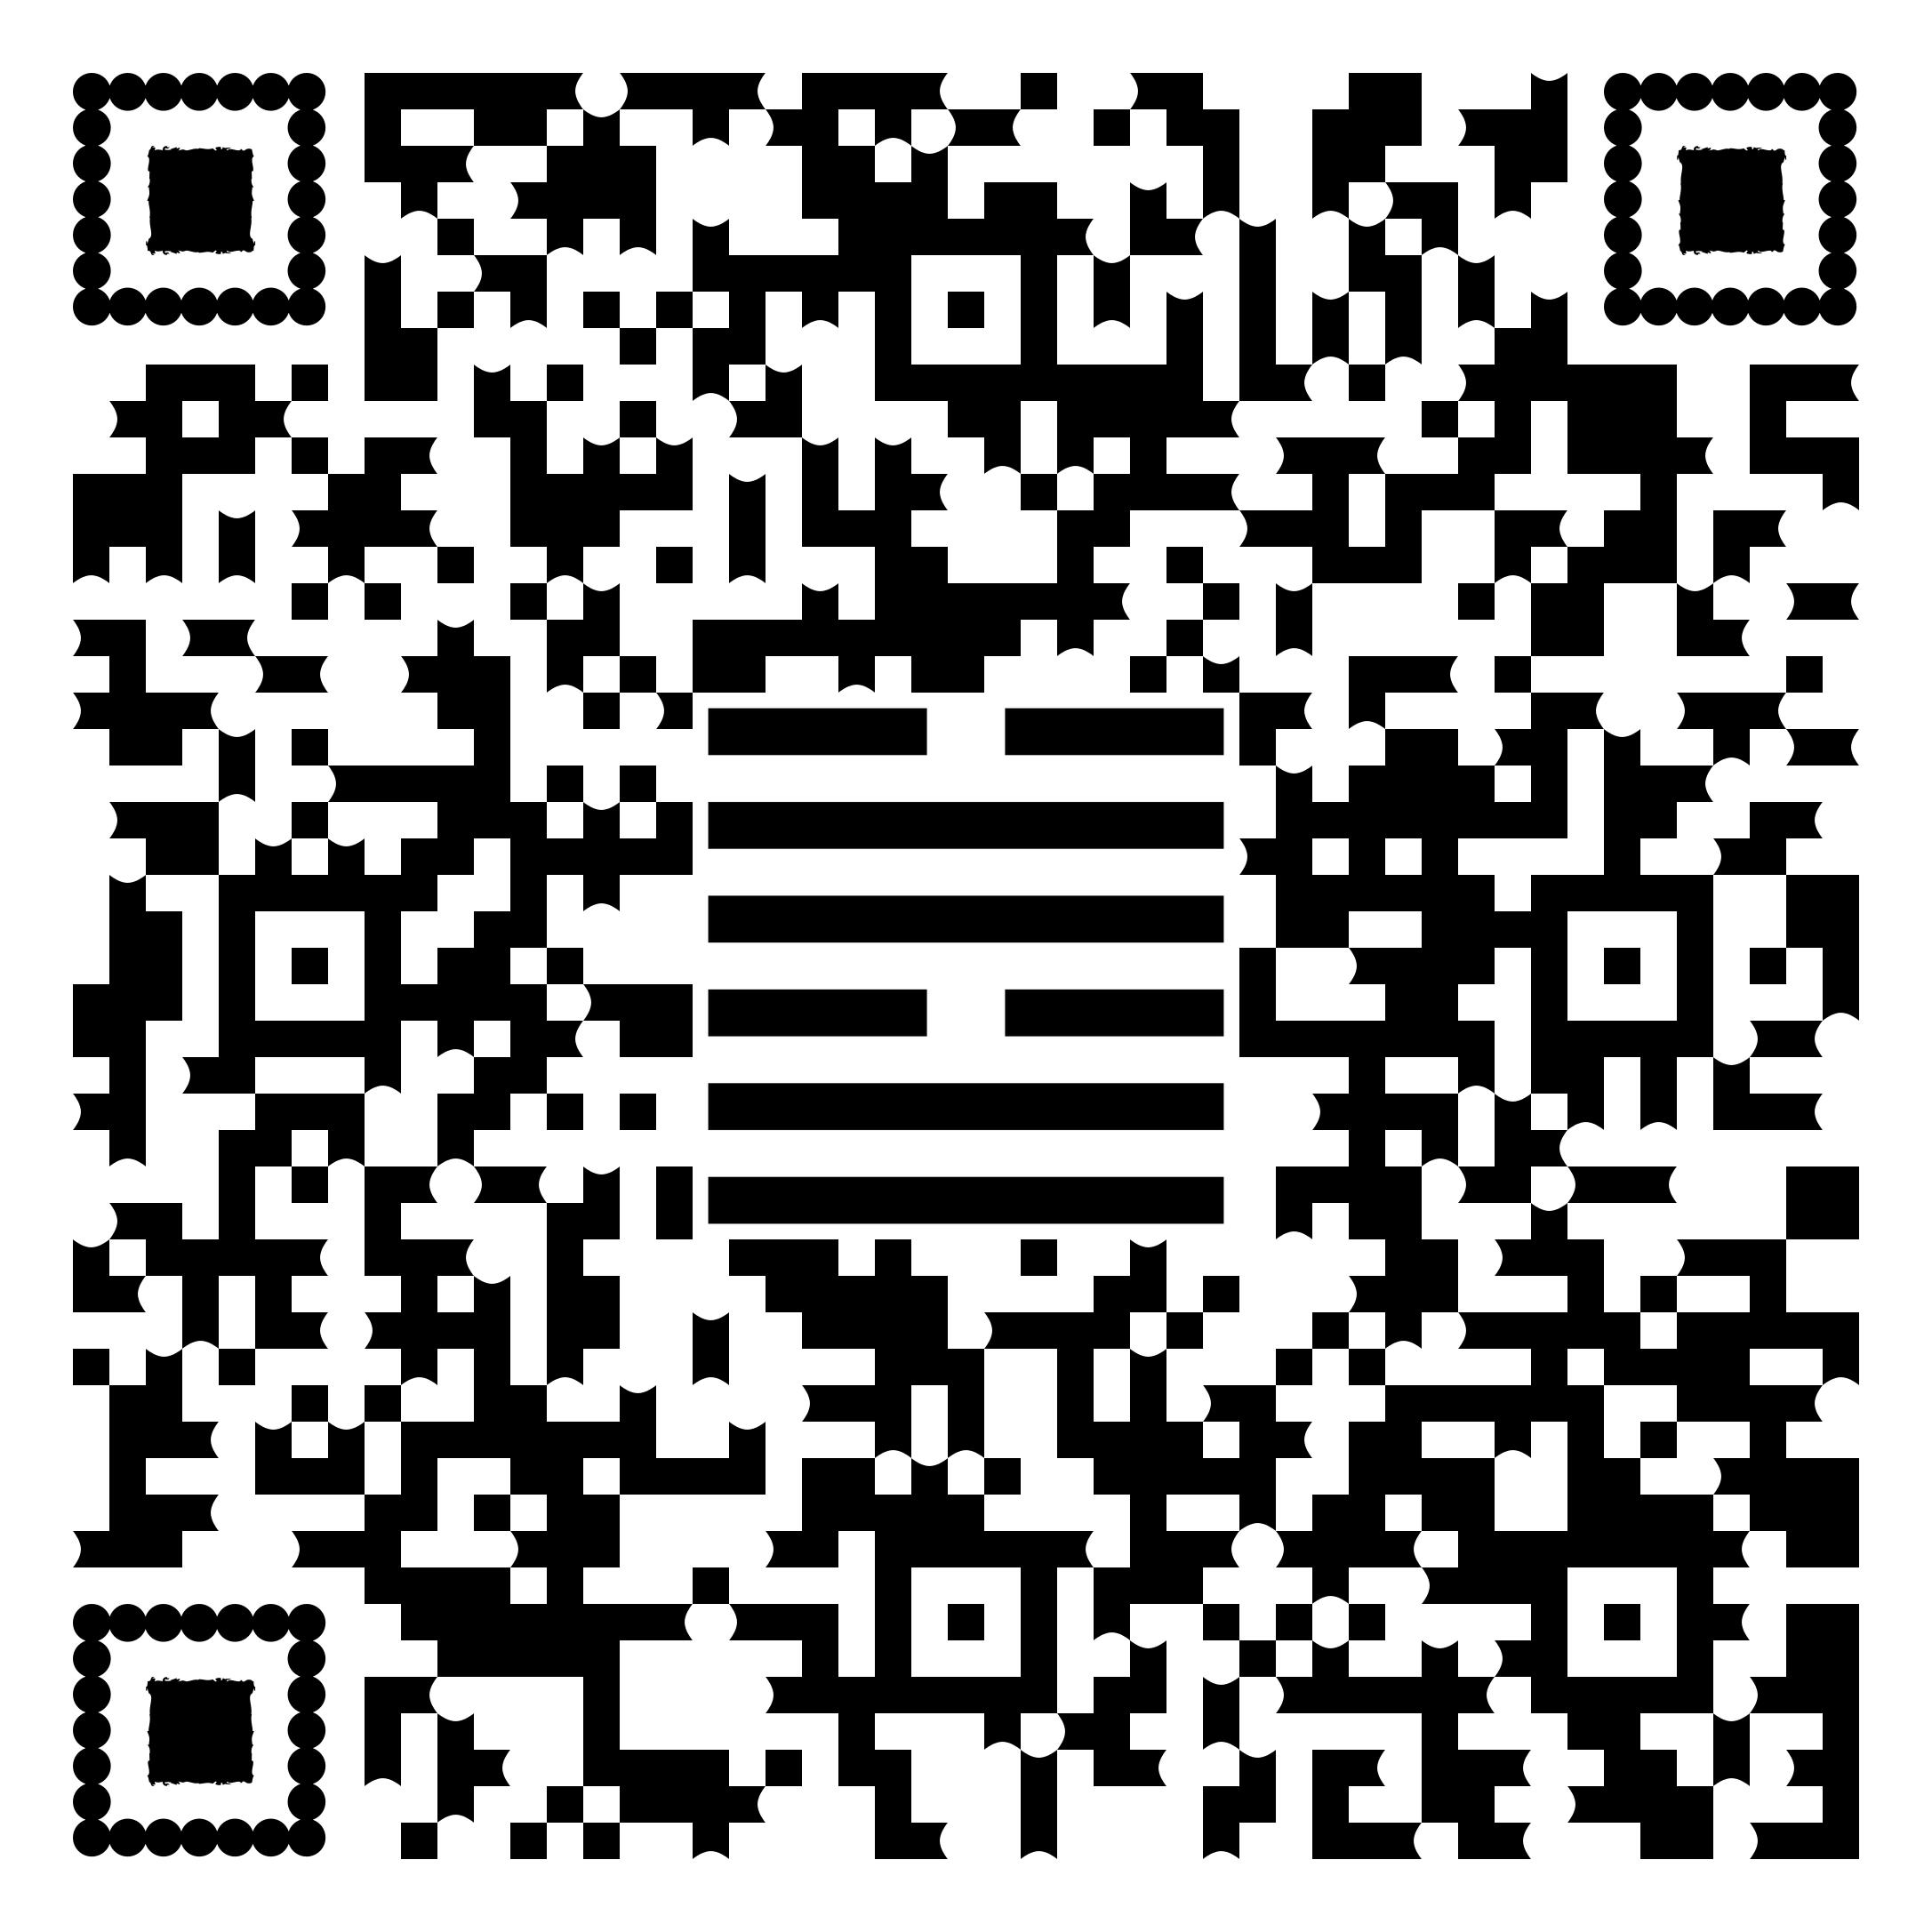 qr-code-59.png